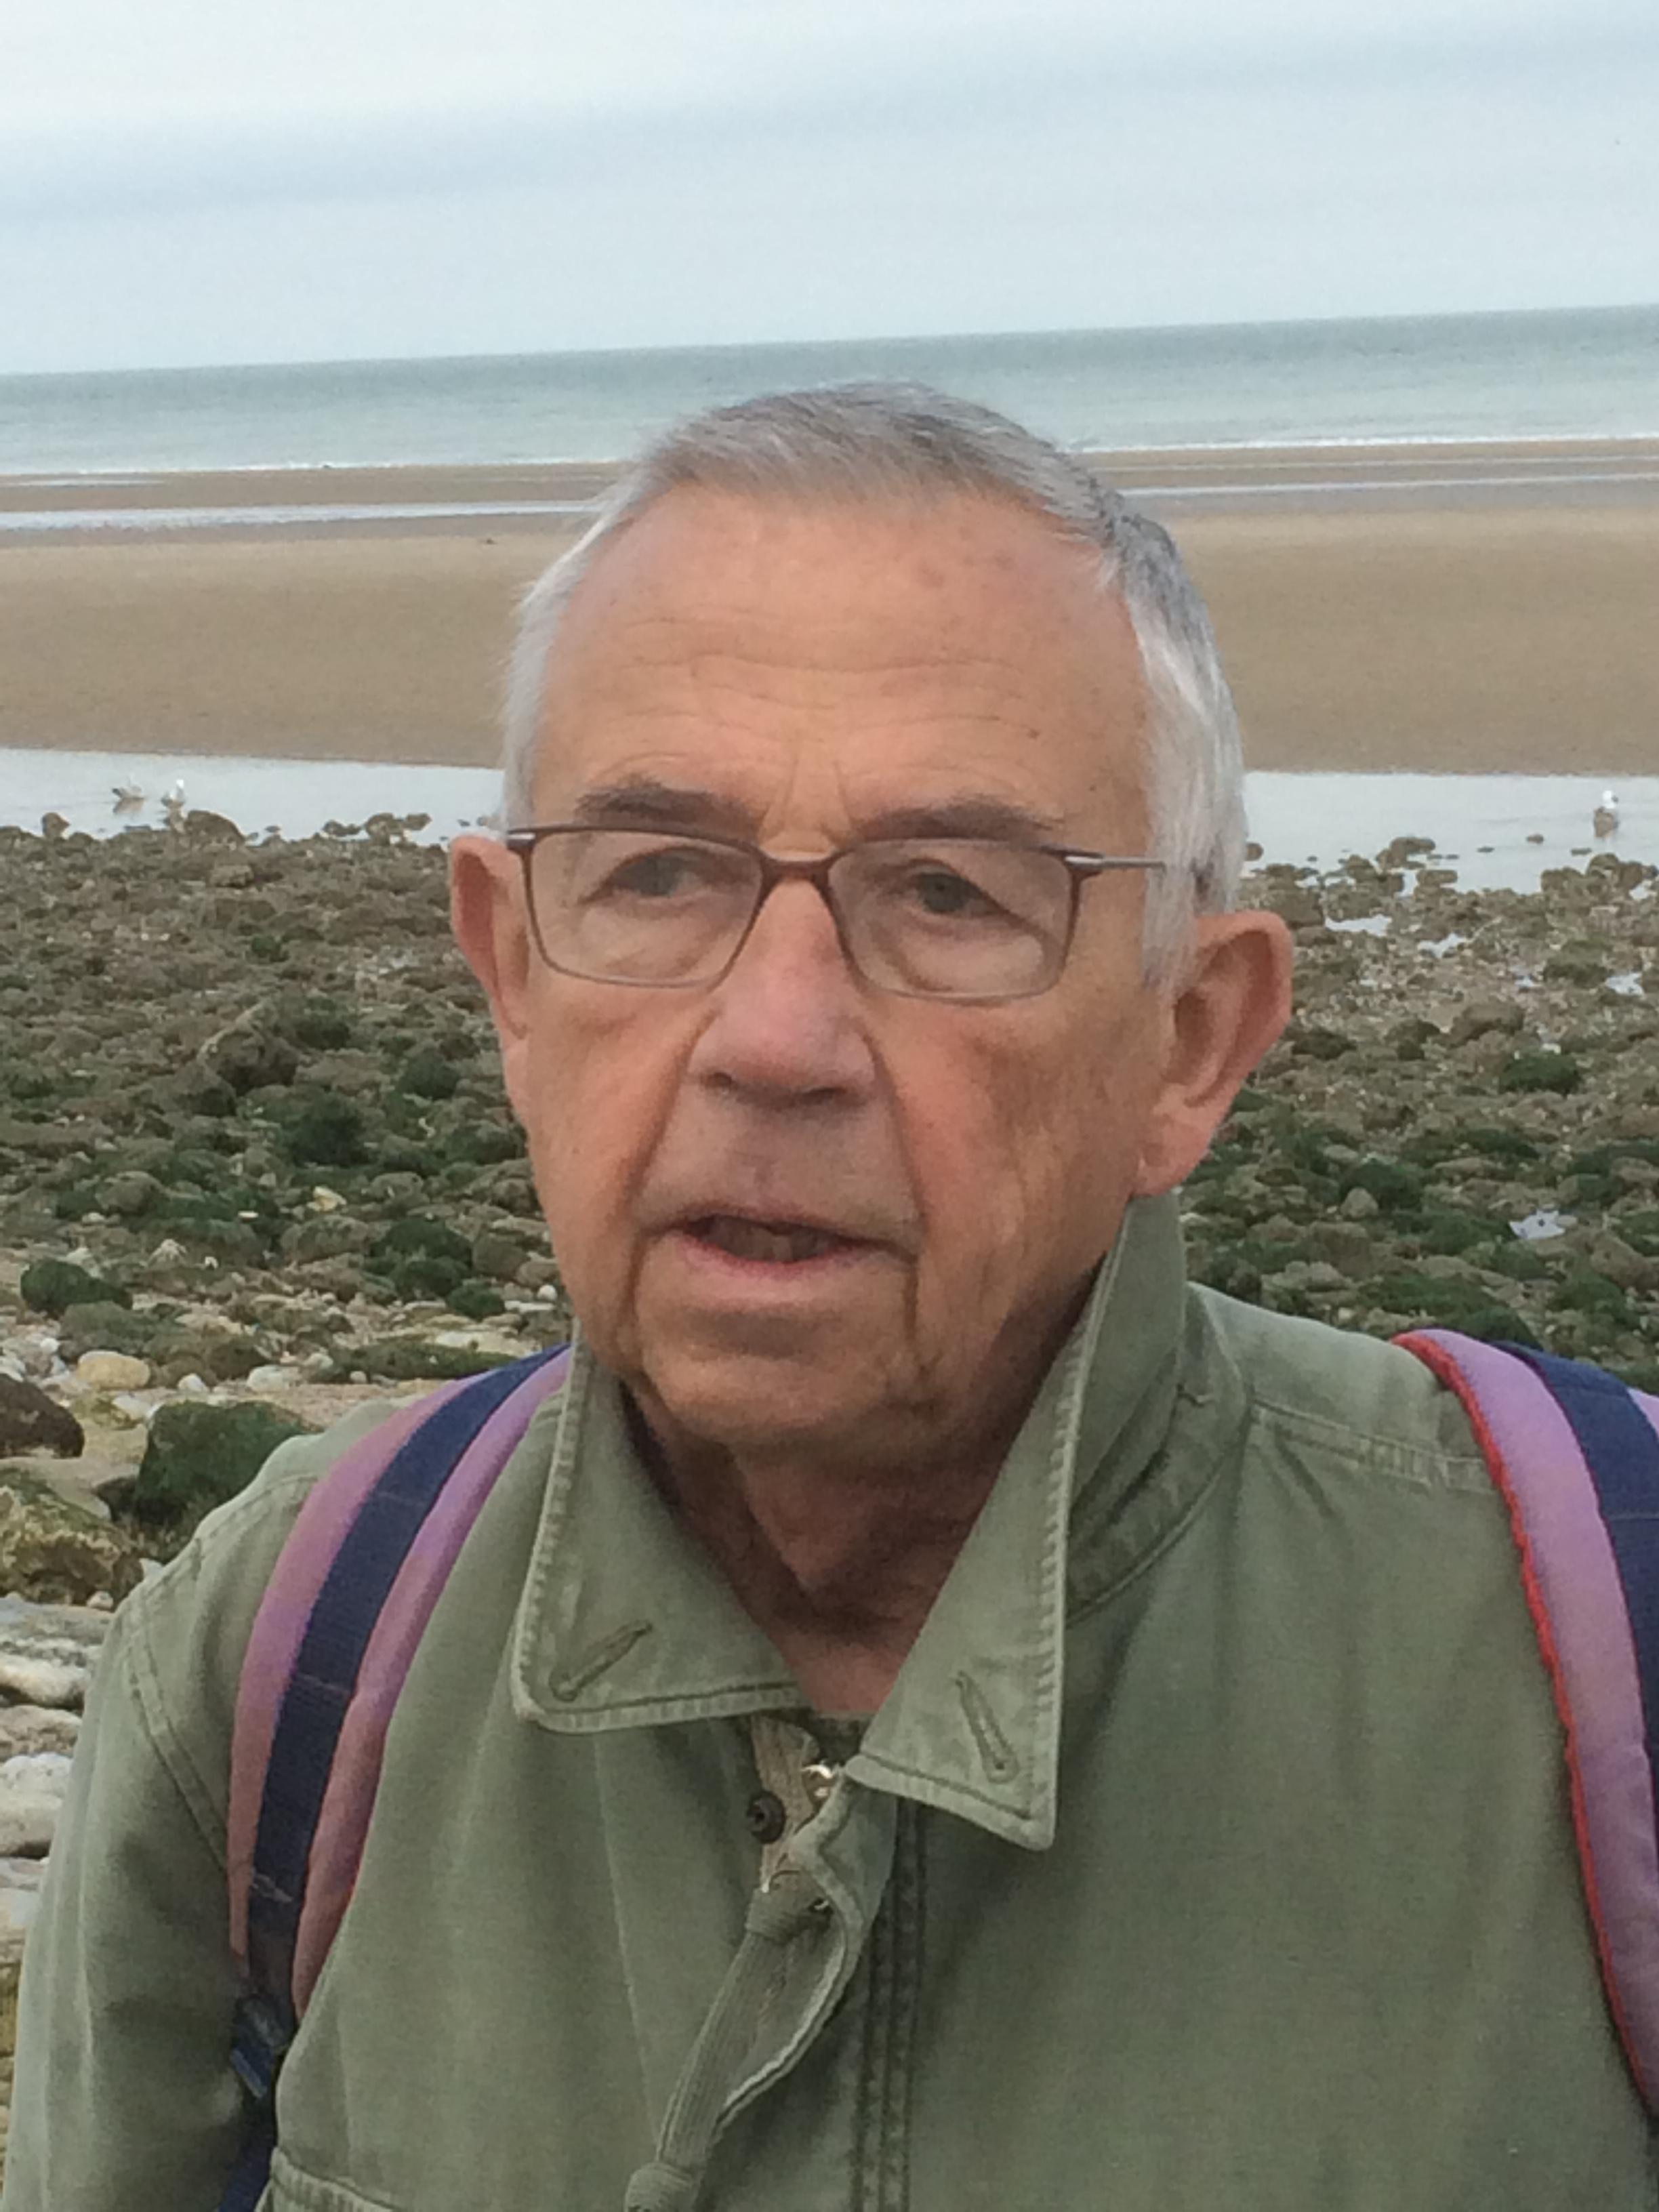 Breton2